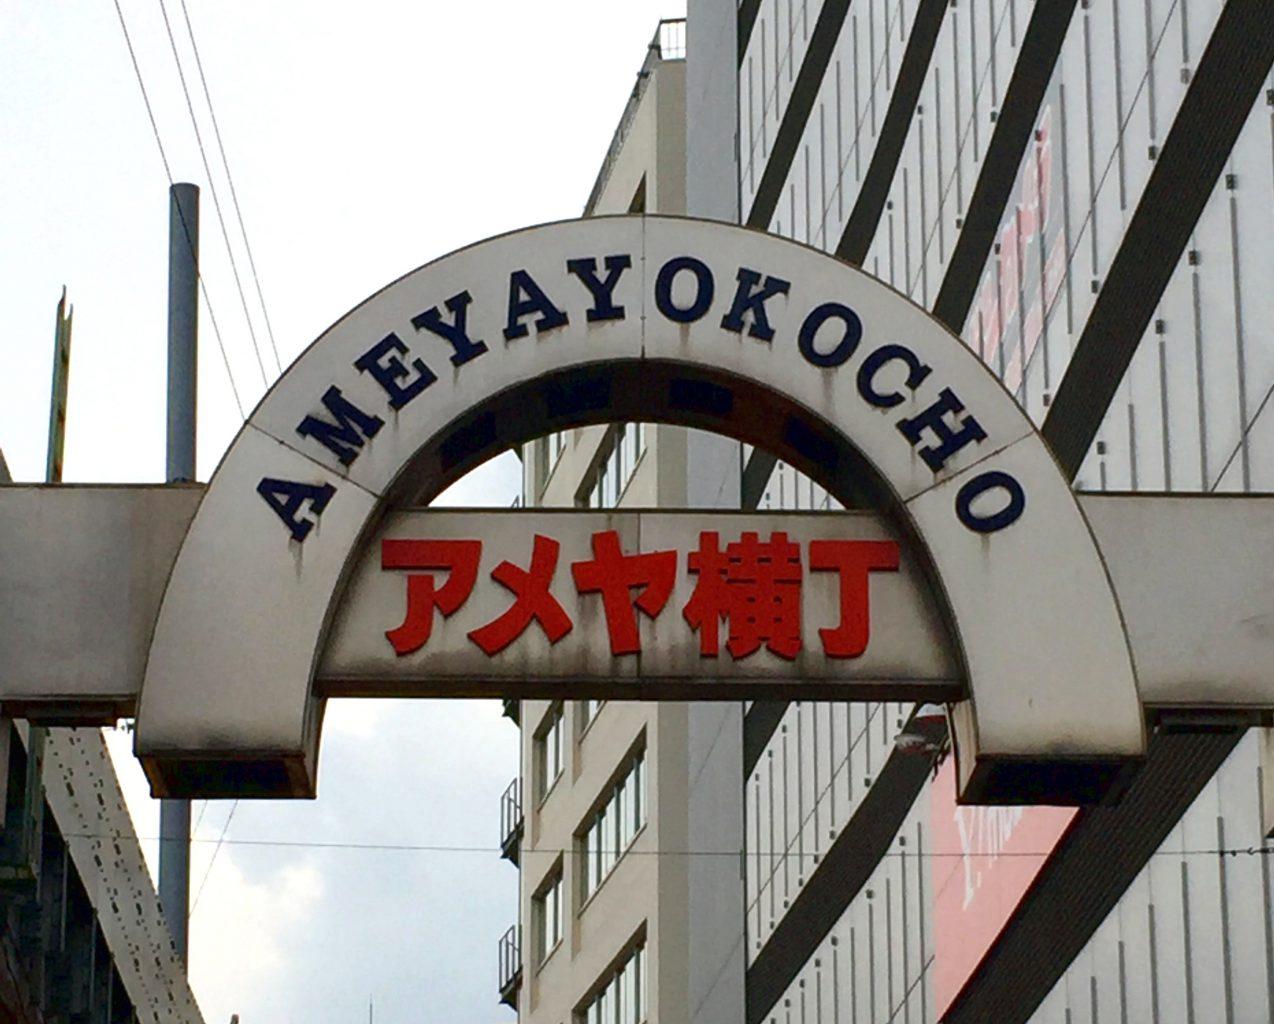 Ameya Yokocho (Ameyoko) | Footsteps of a Dreamer